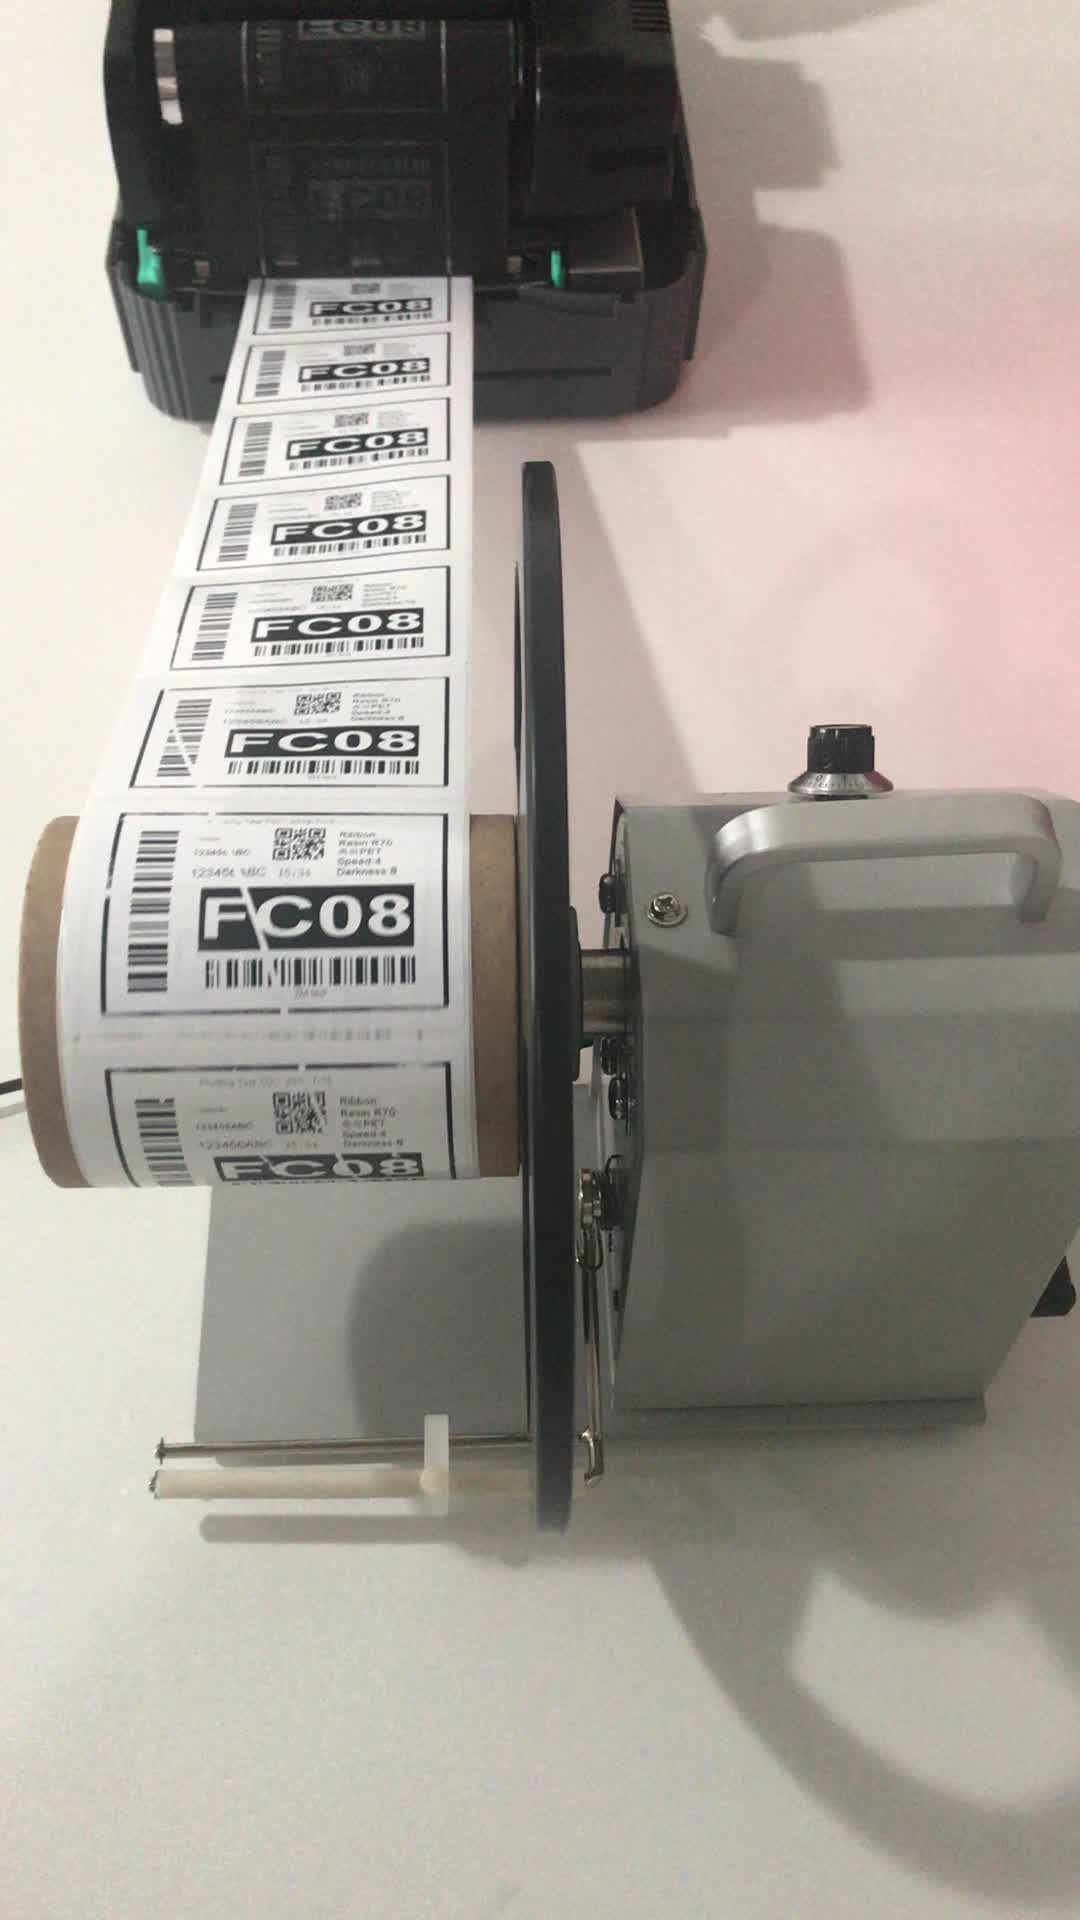 Coditeck Tự Động Nhãn Rewinder AL Reel Để Reel